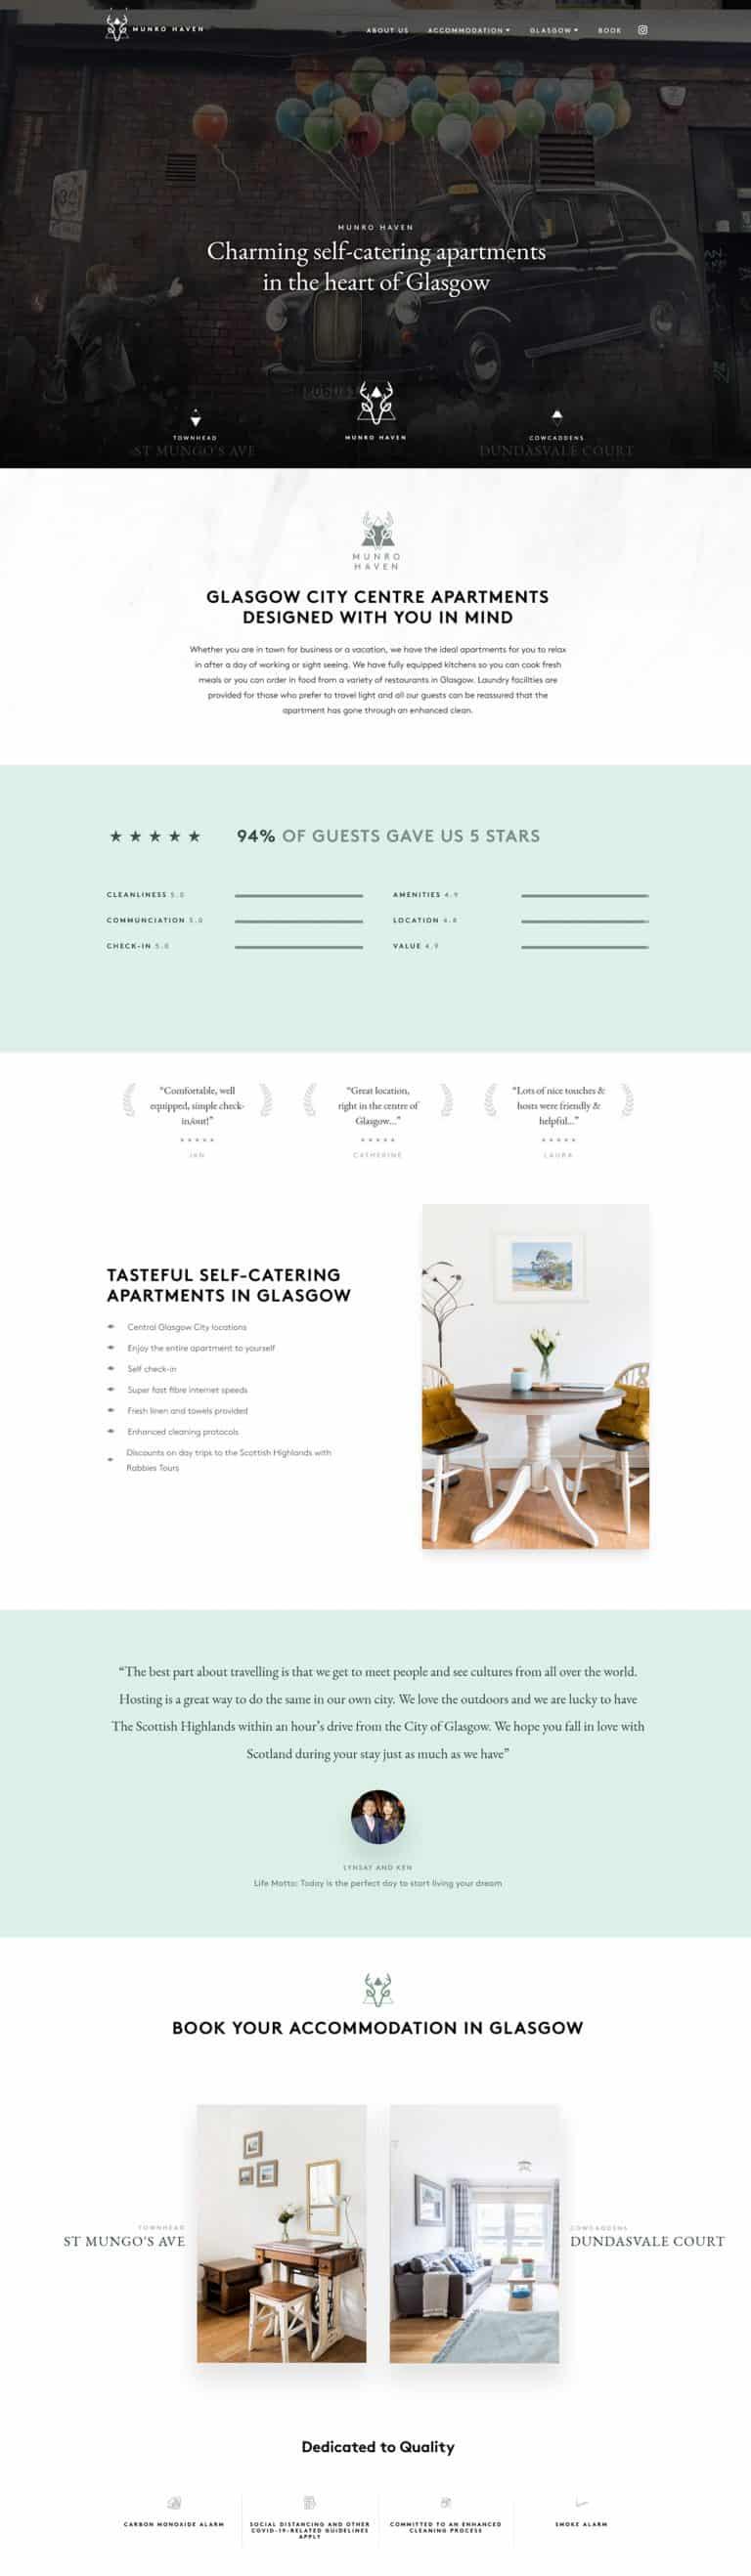 booking website designers in Glasgow